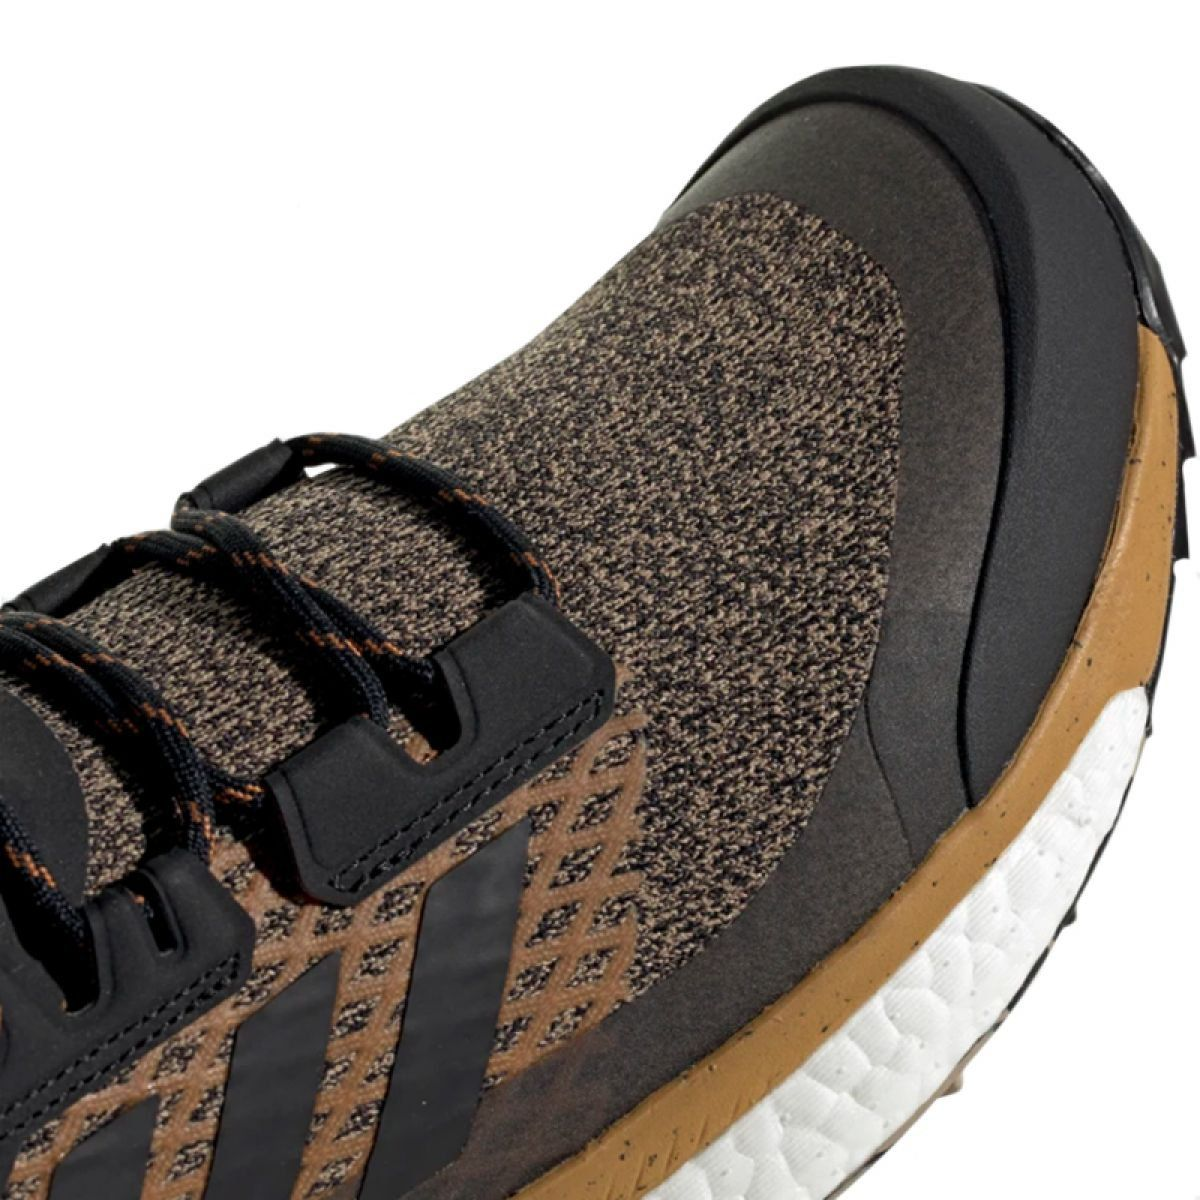 Buty Adidas Terrex Free Hiker M Ef1307 Brazowe Czarne Wielokolorowe Climbing Shoes Sports Shoes Adidas Trekking Shoes